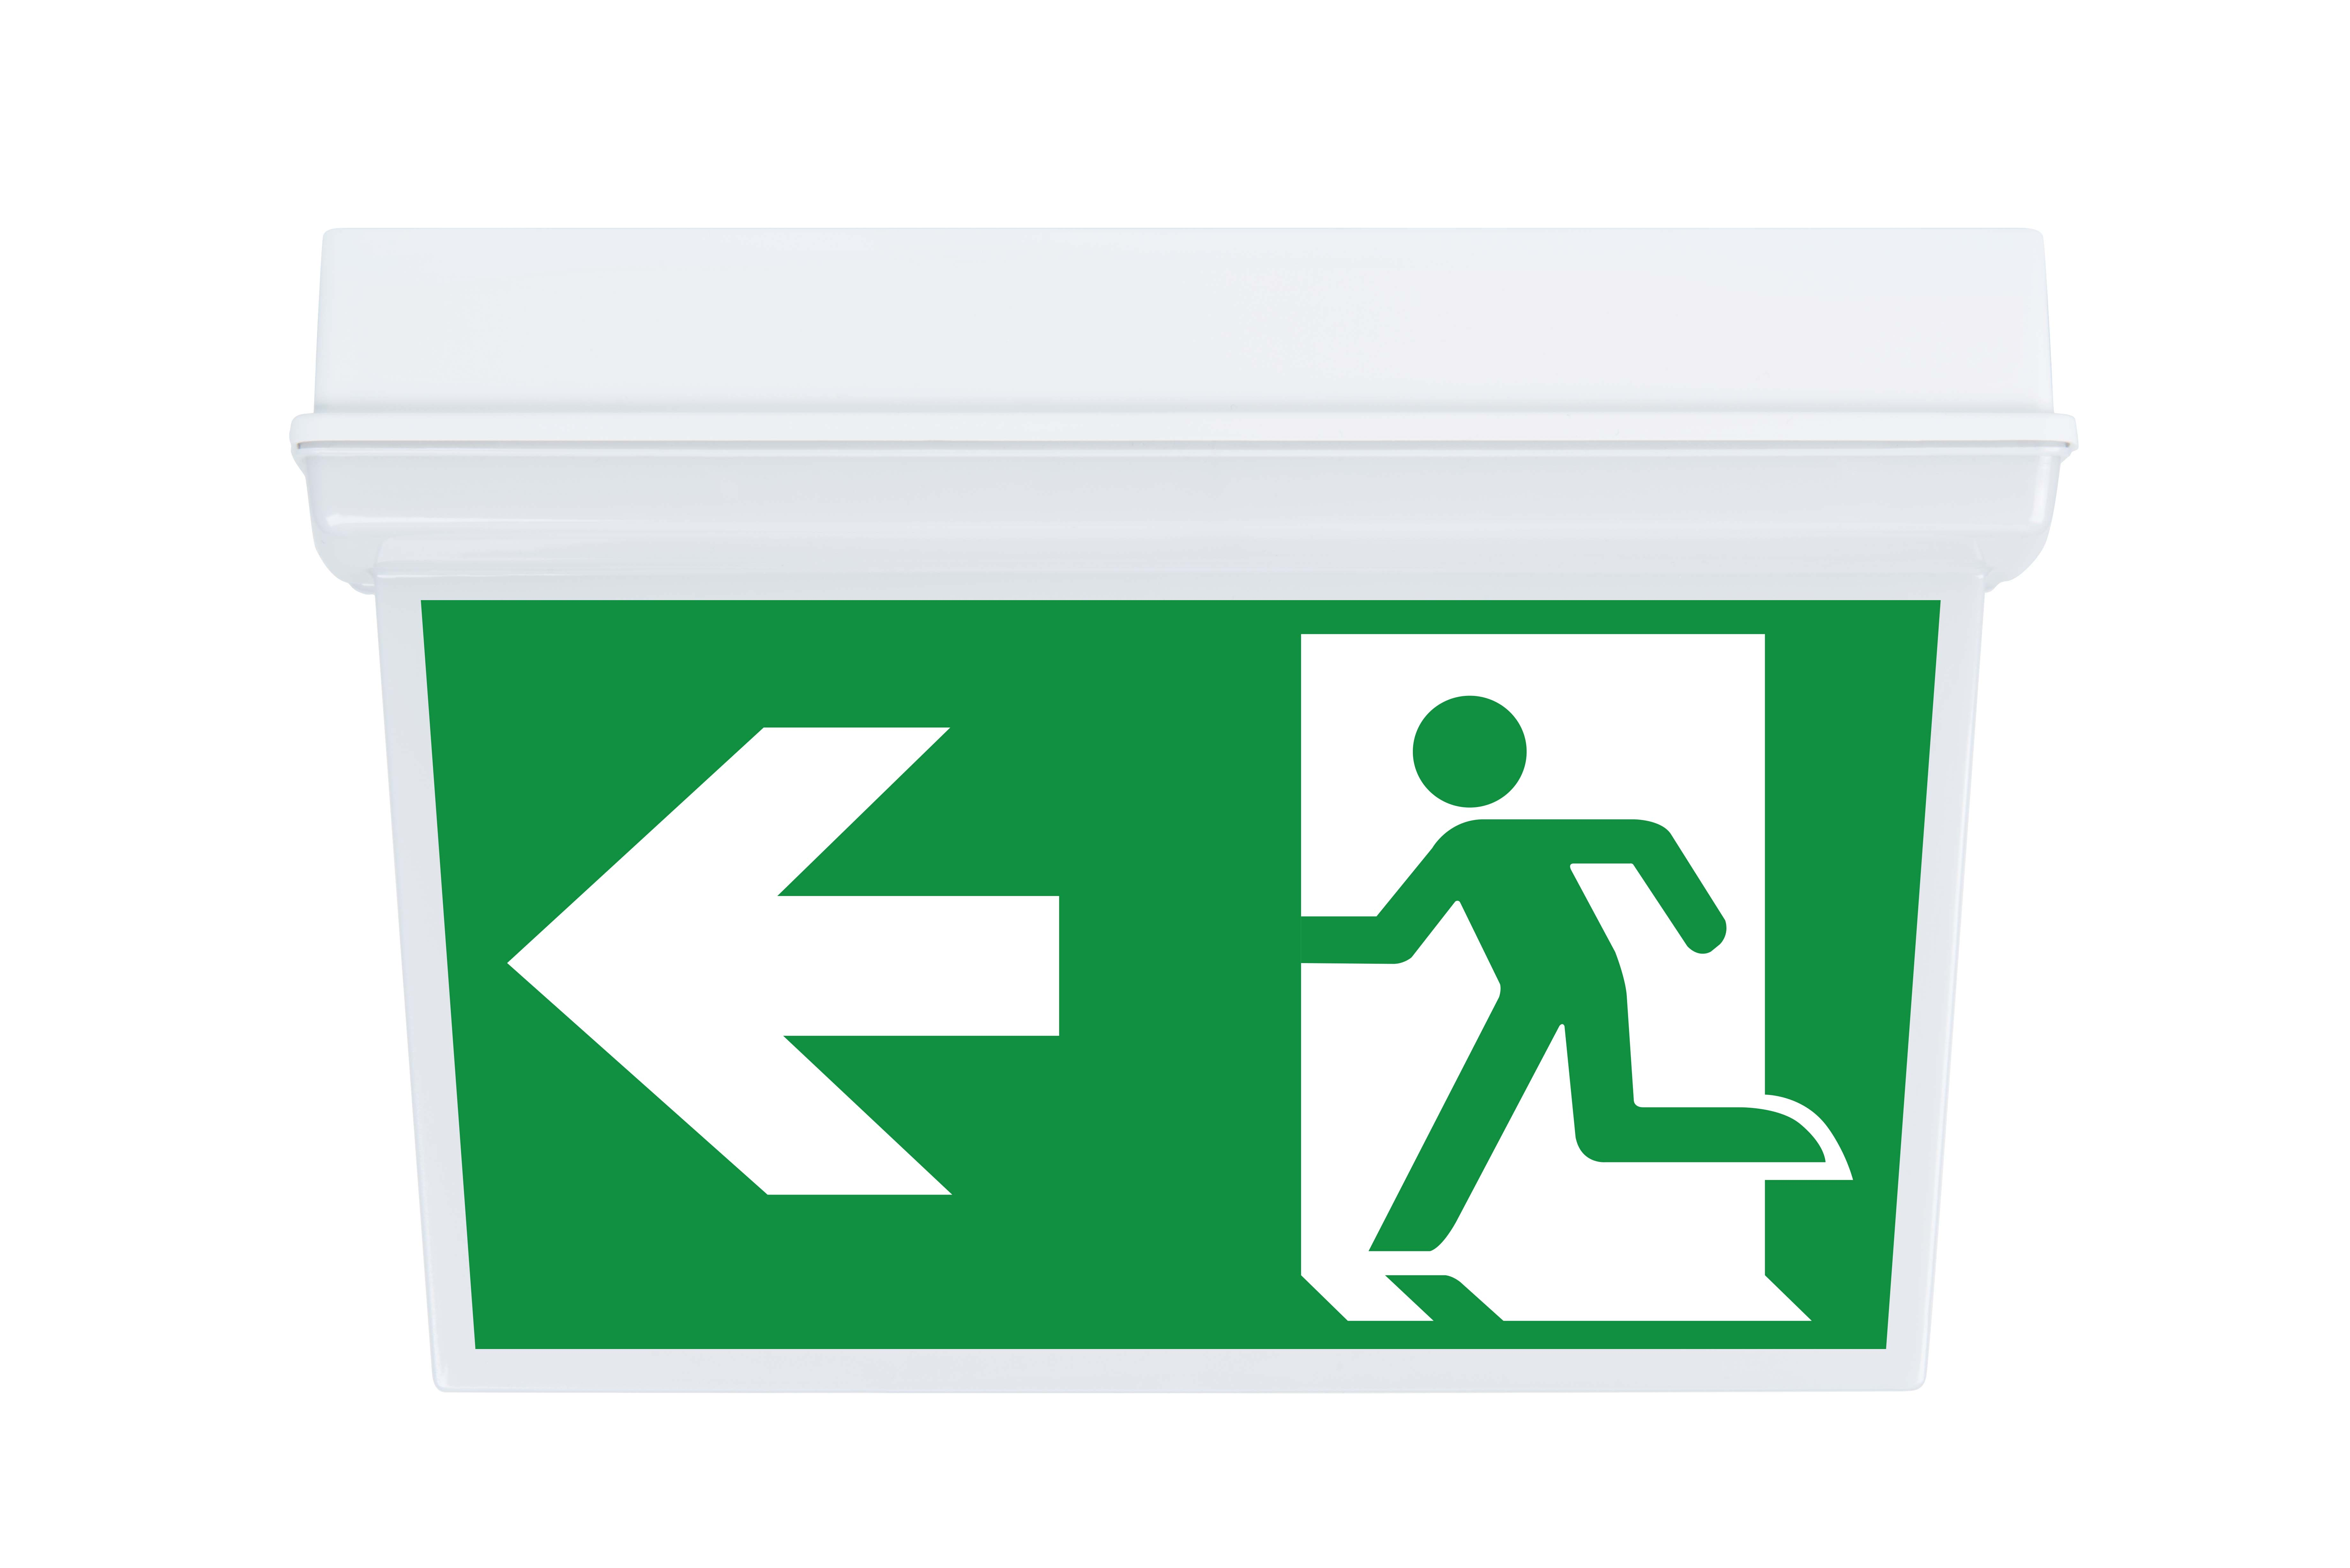 Lampa evacuare led Intelight 98305 3h mentinut/nementinut test manual 154lm 1